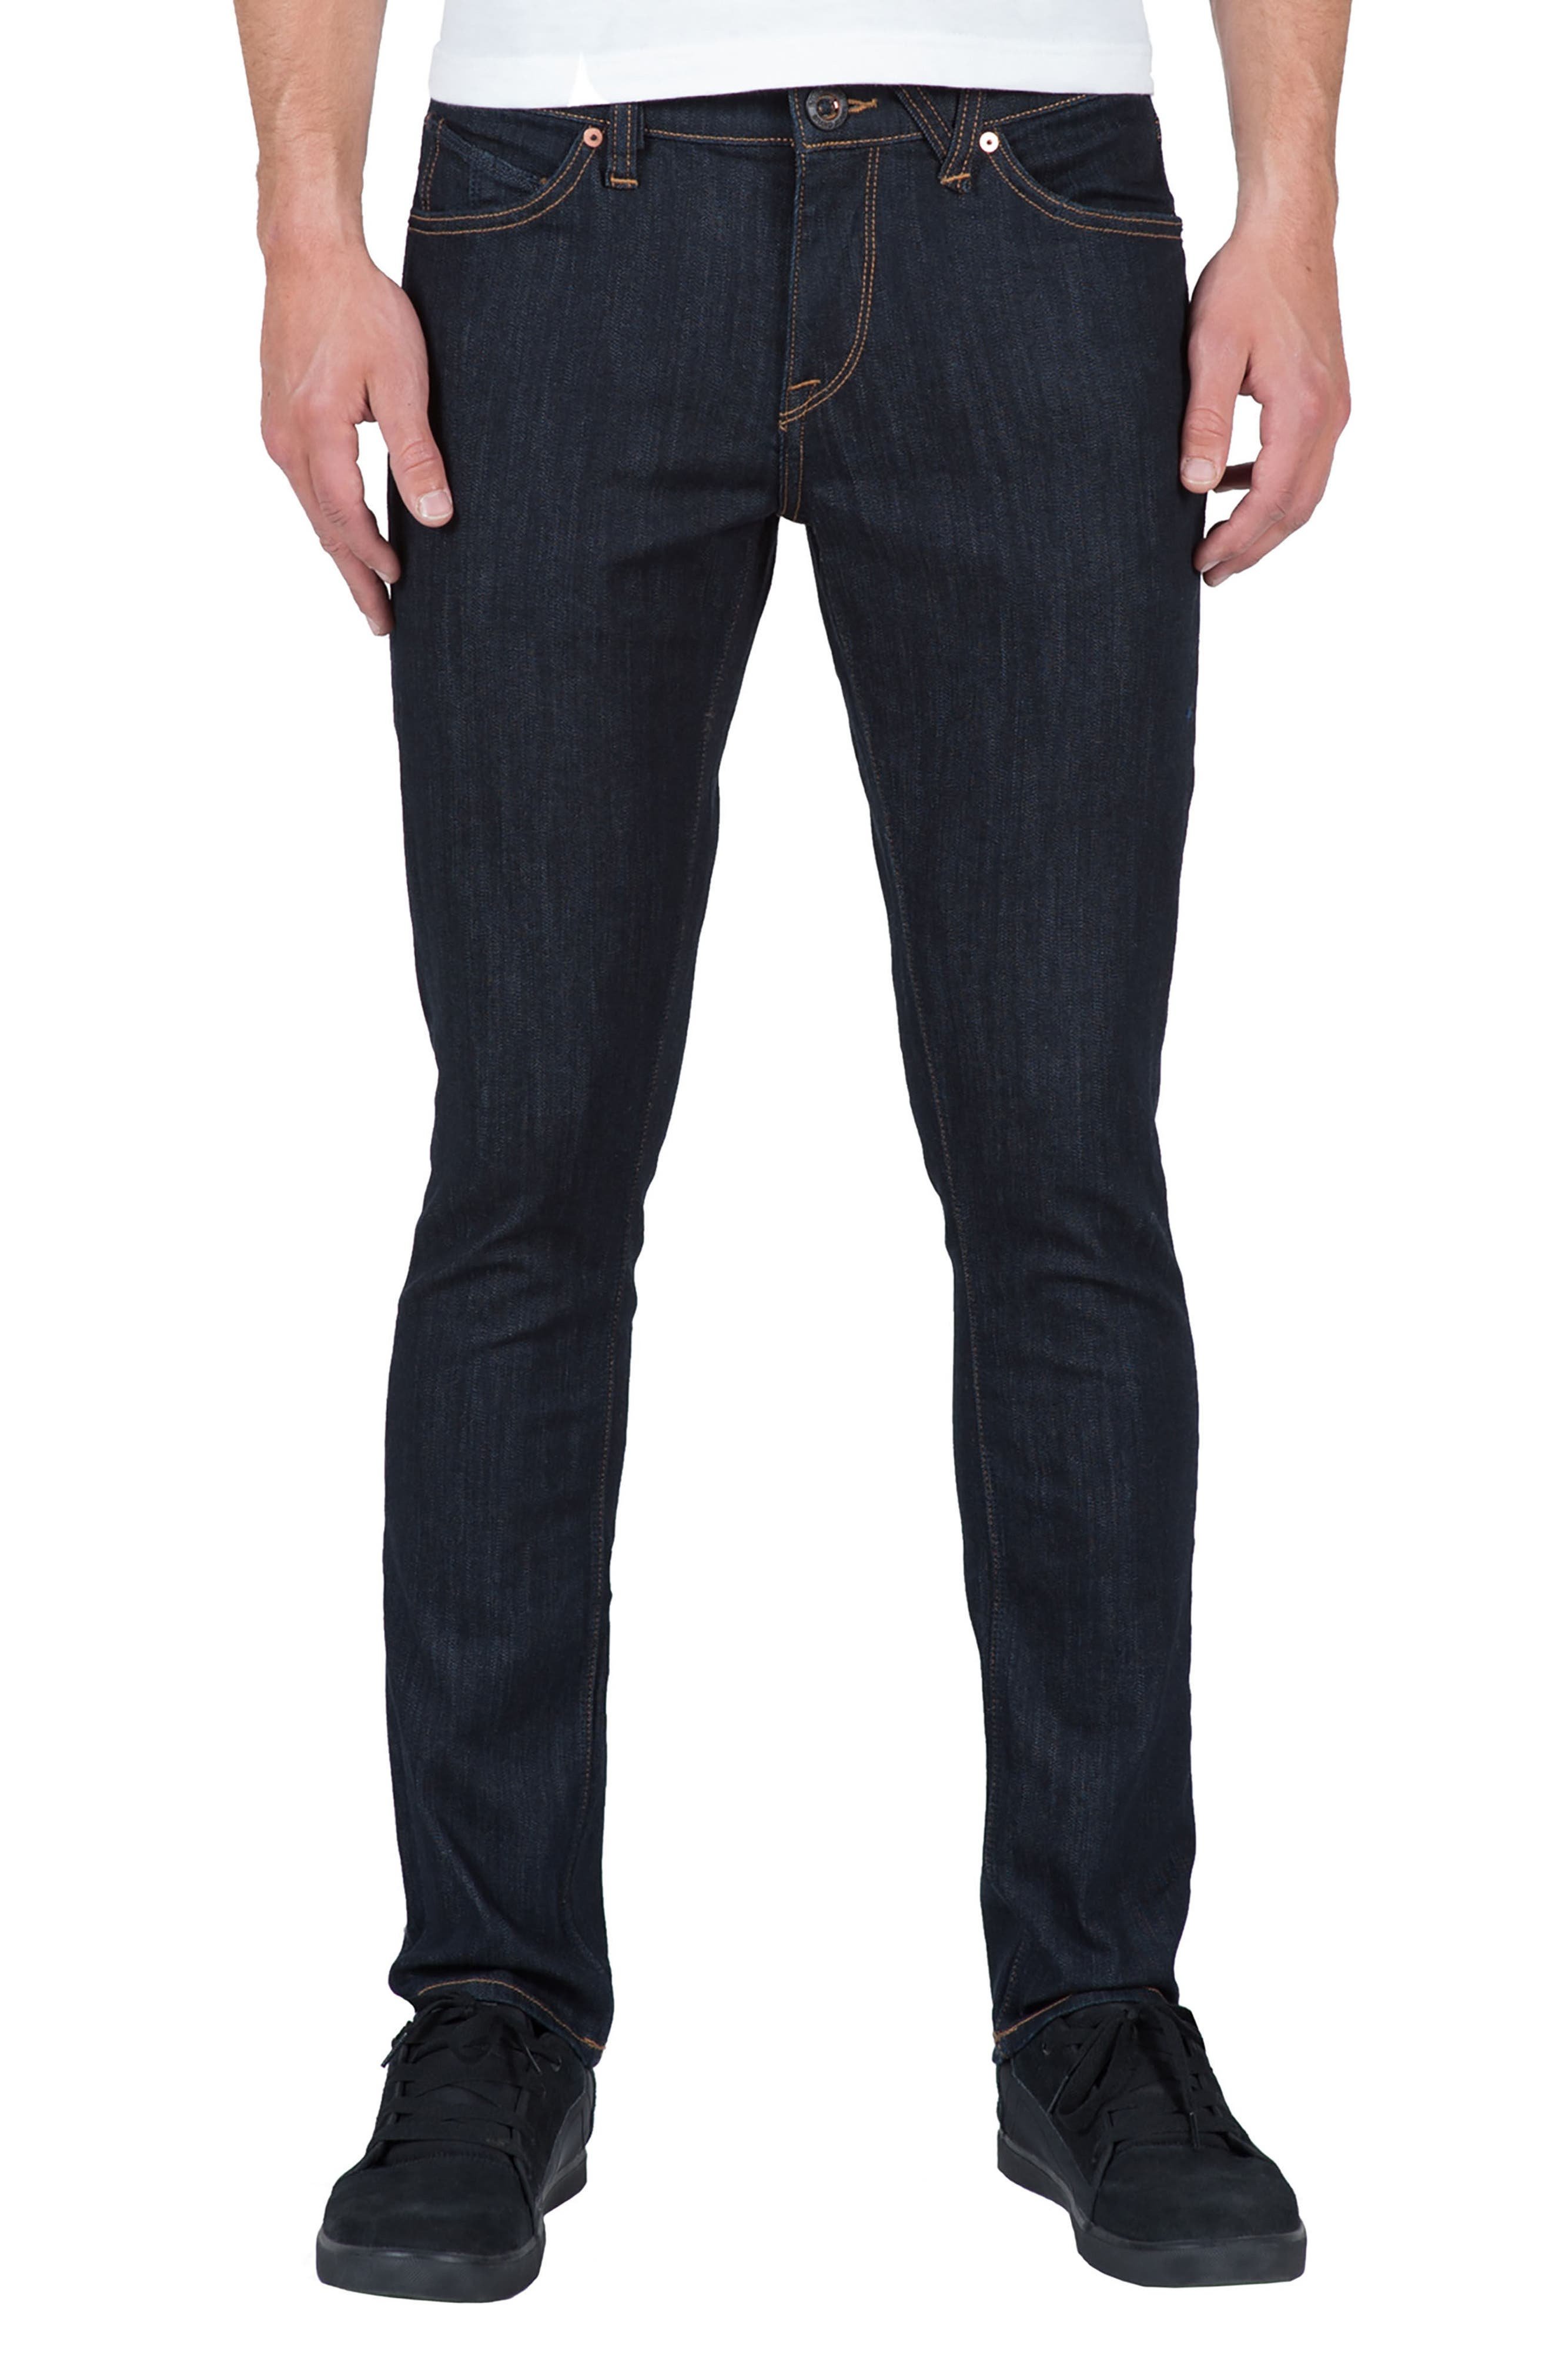 2x4 Slim Straight Leg Jeans,                         Main,                         color, Blue Rinse